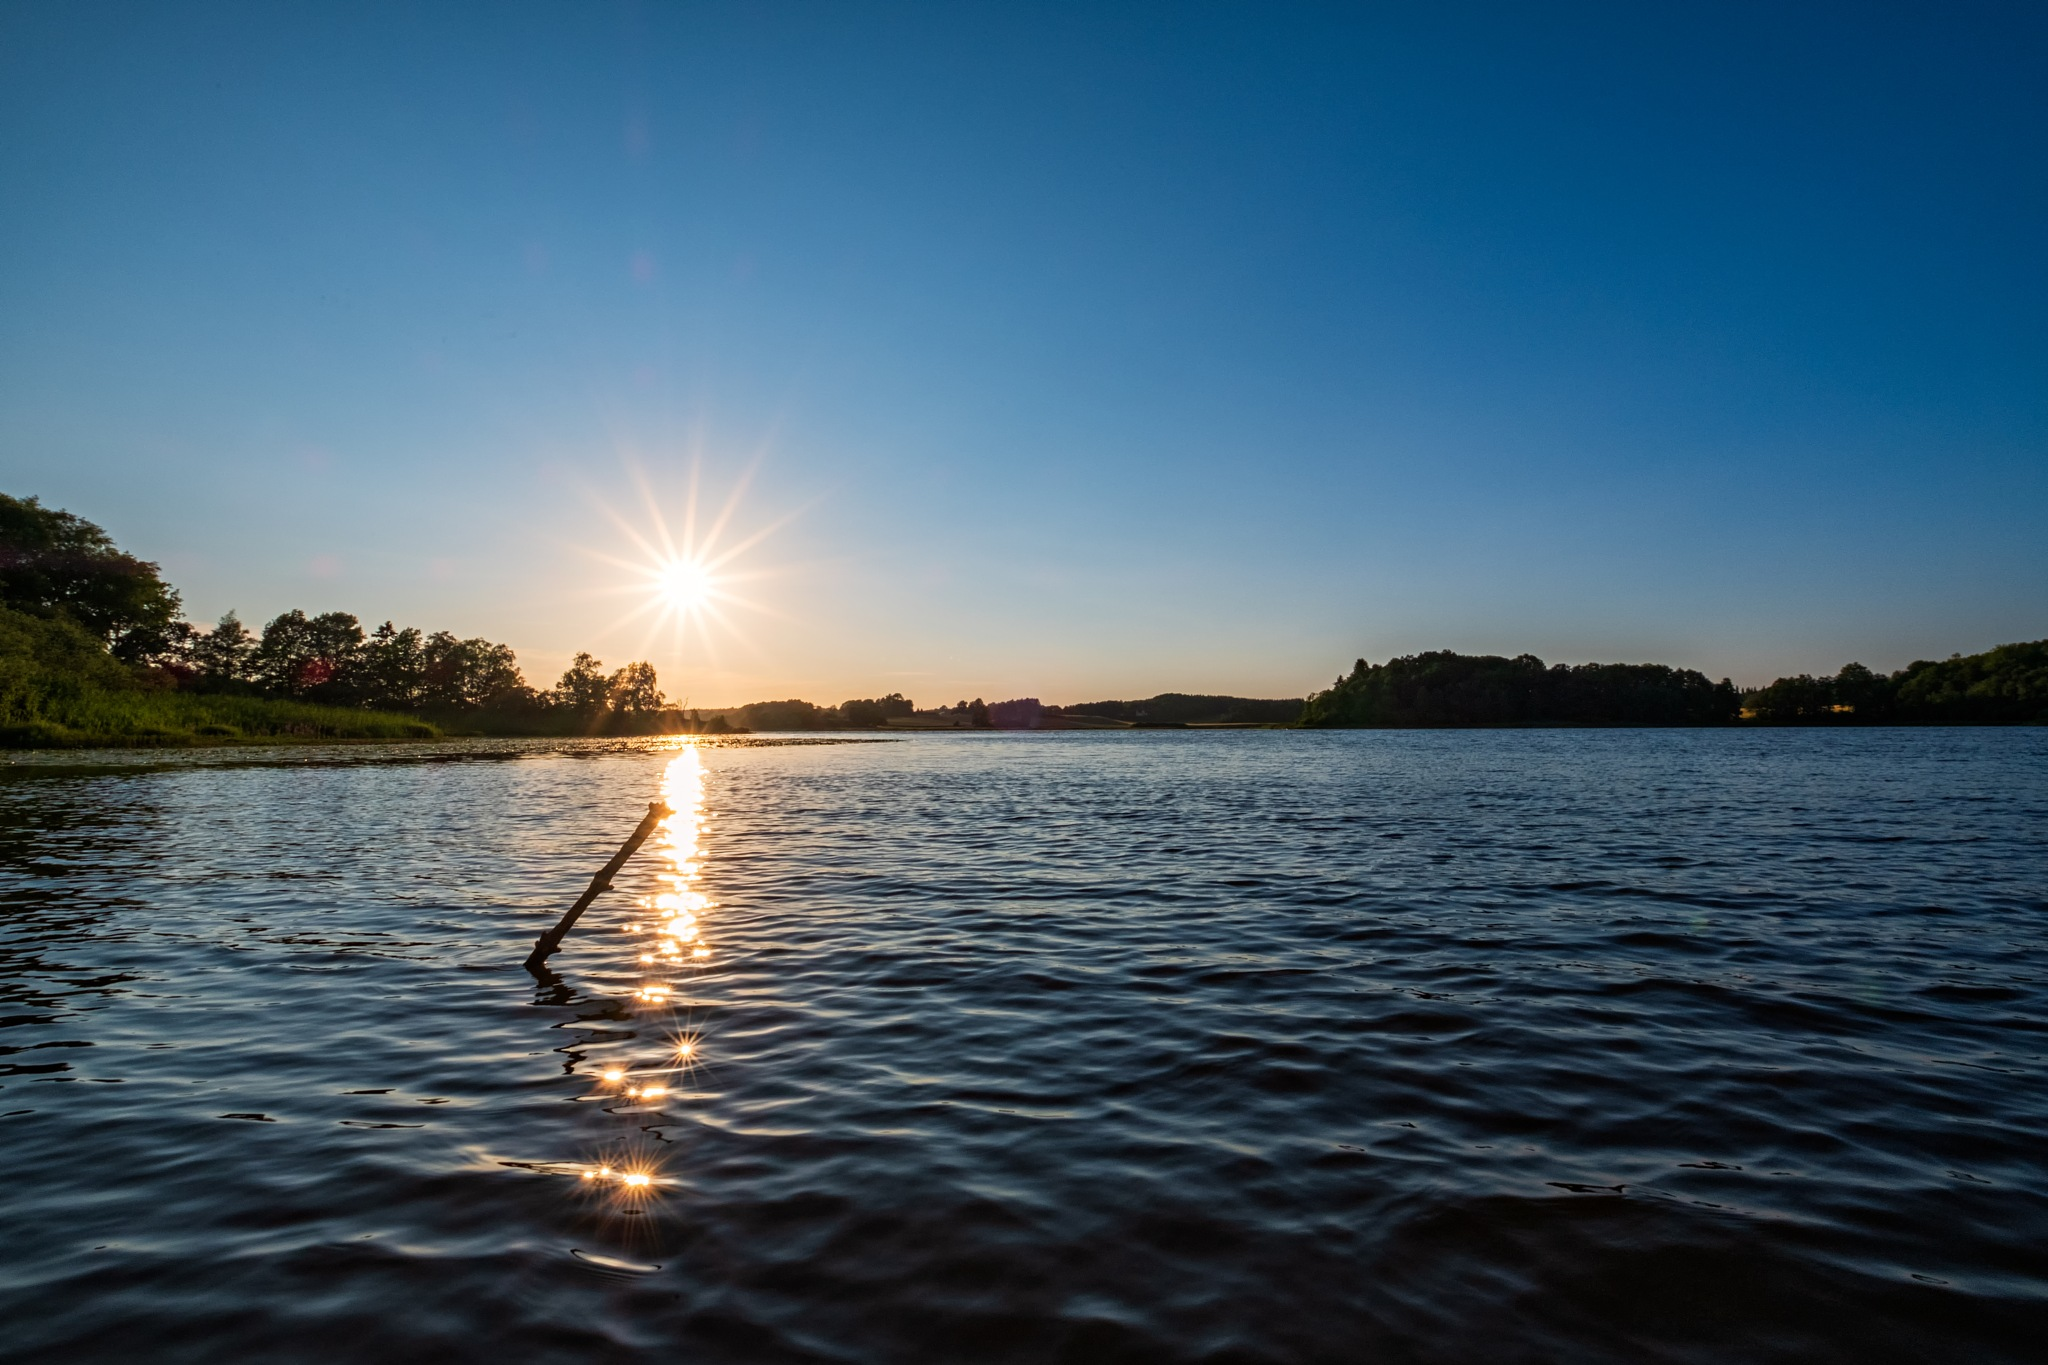 Sun reflection stars by Mikael Jakobsson